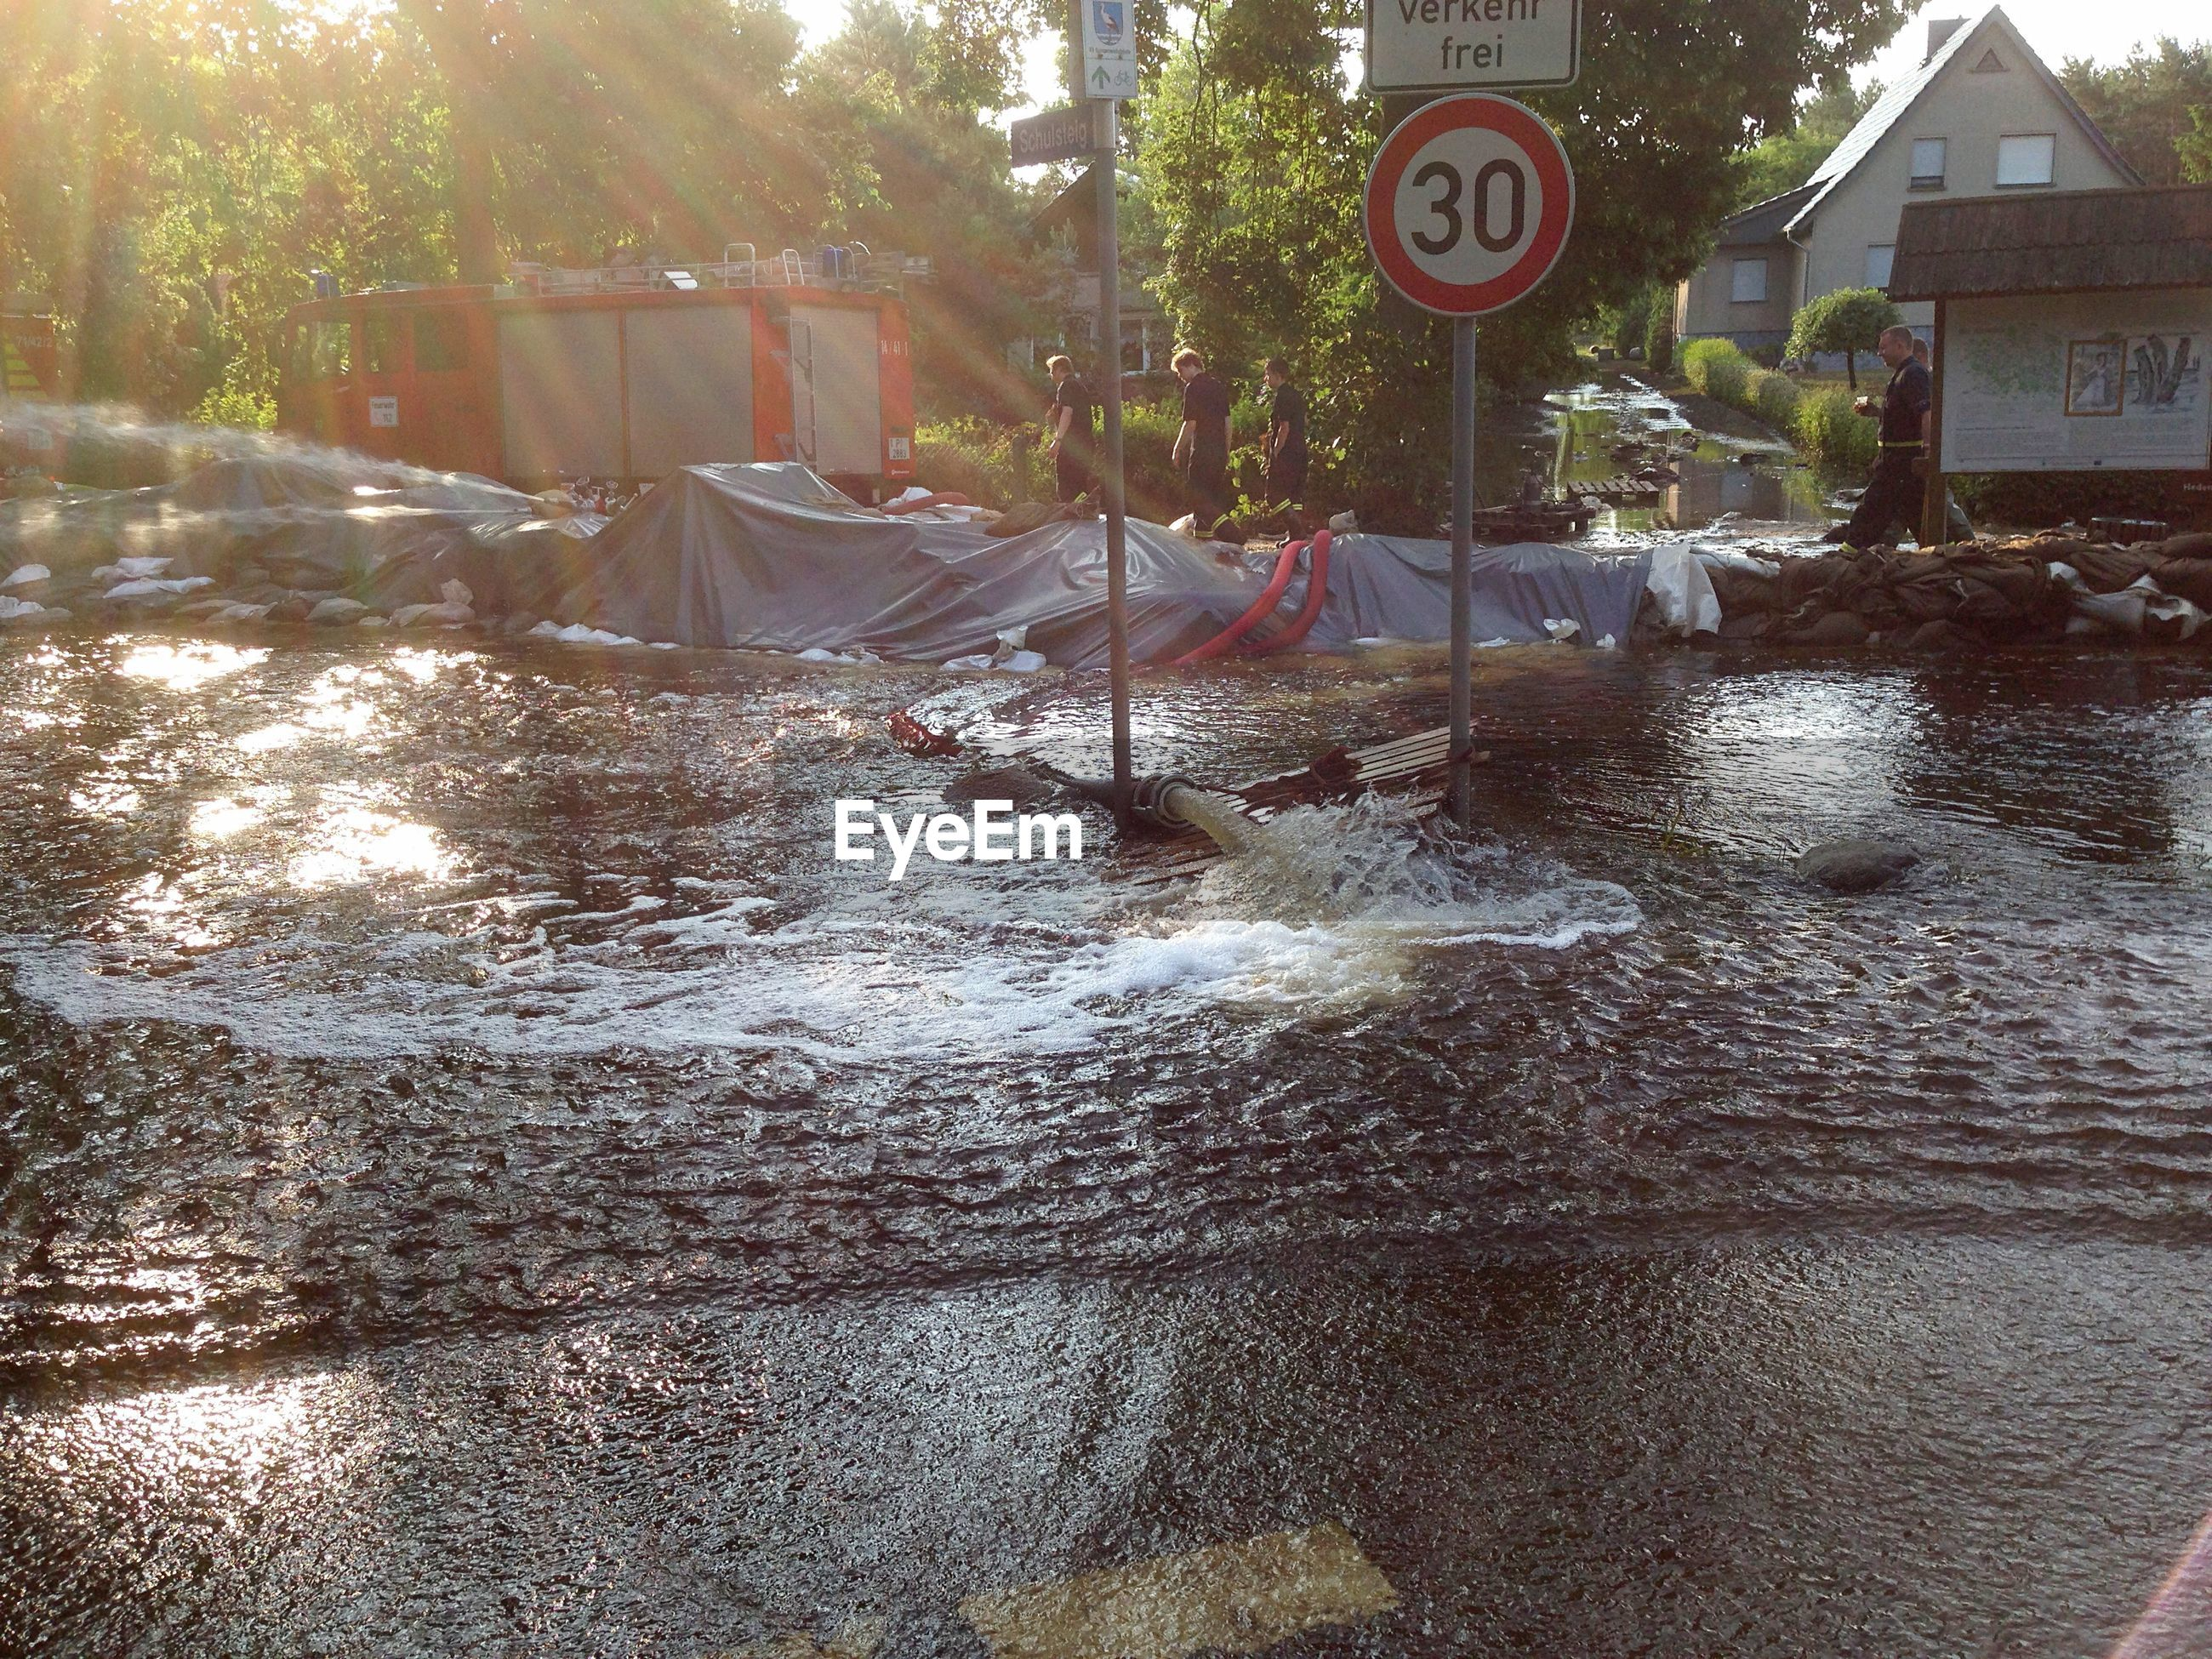 Flooded street amidst trees